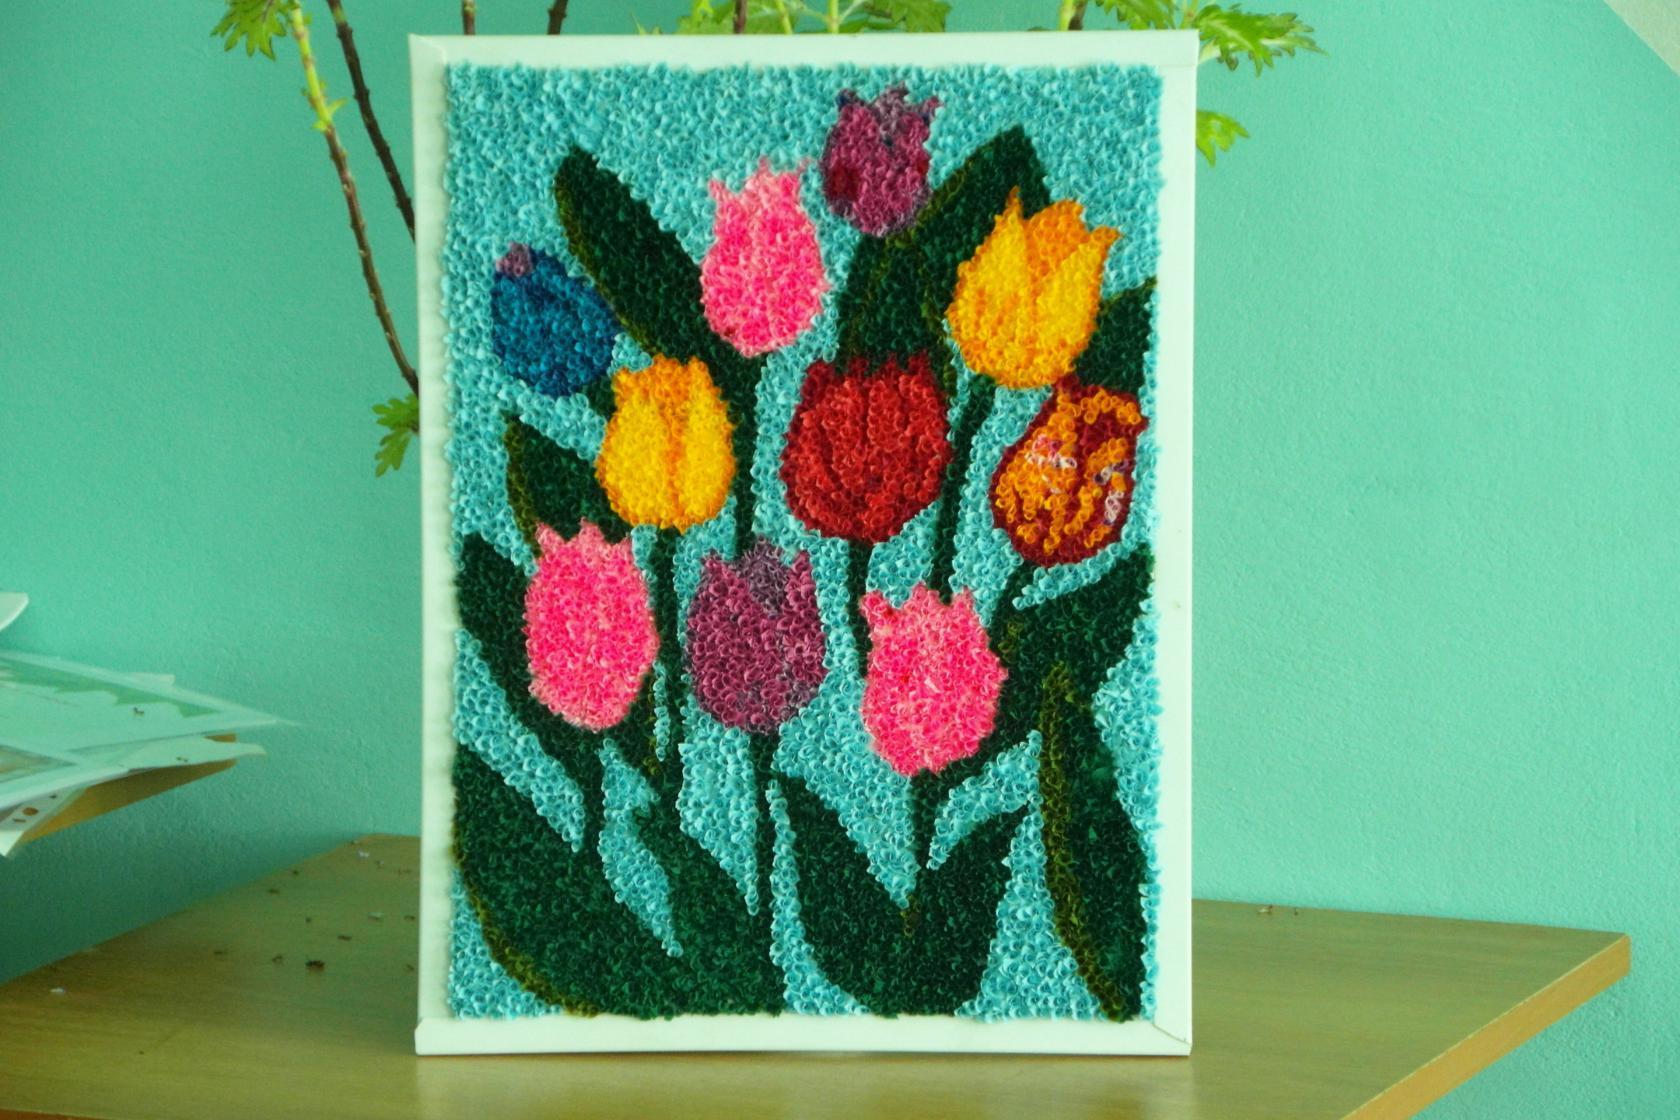 цветы из бумажных салфеток фото варианты